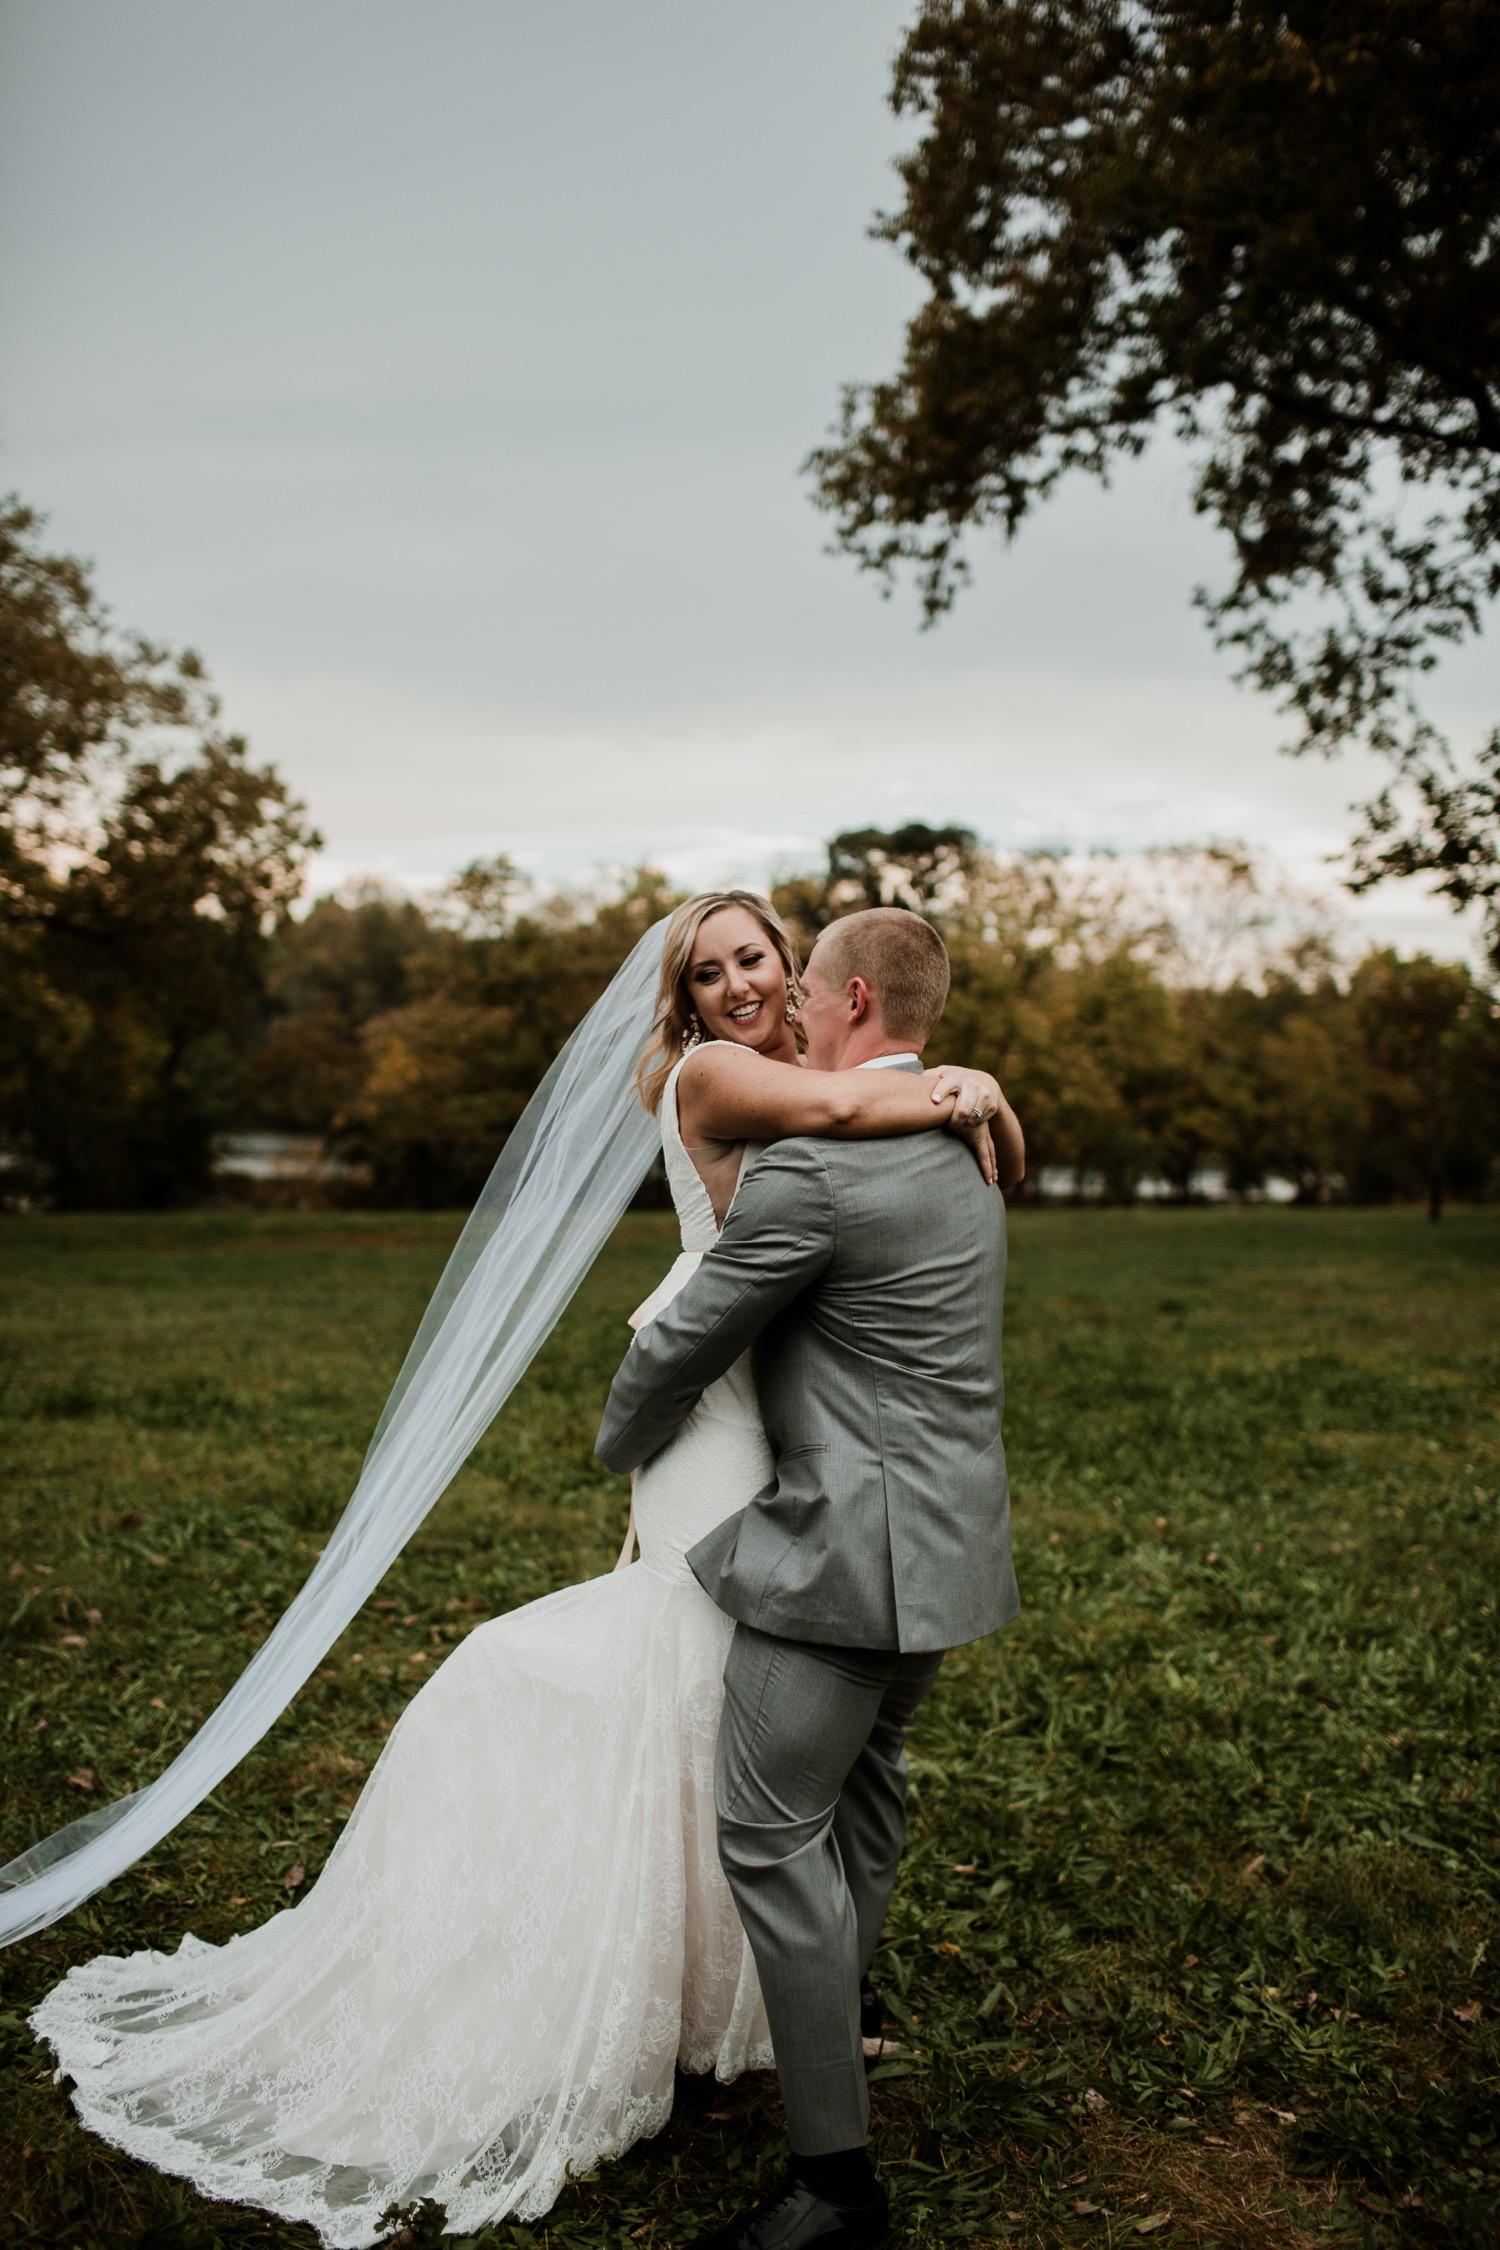 24_Photographer_Groom_Bridesmaids_ColumbusWeddingPhotographer_Bride_ColumbusWedding_Photography_FloridaWeddingPhotographer_Vue_Strongwater_Groomsmen_Wedding_Ohio_Jorgensen_Columbus.jpg